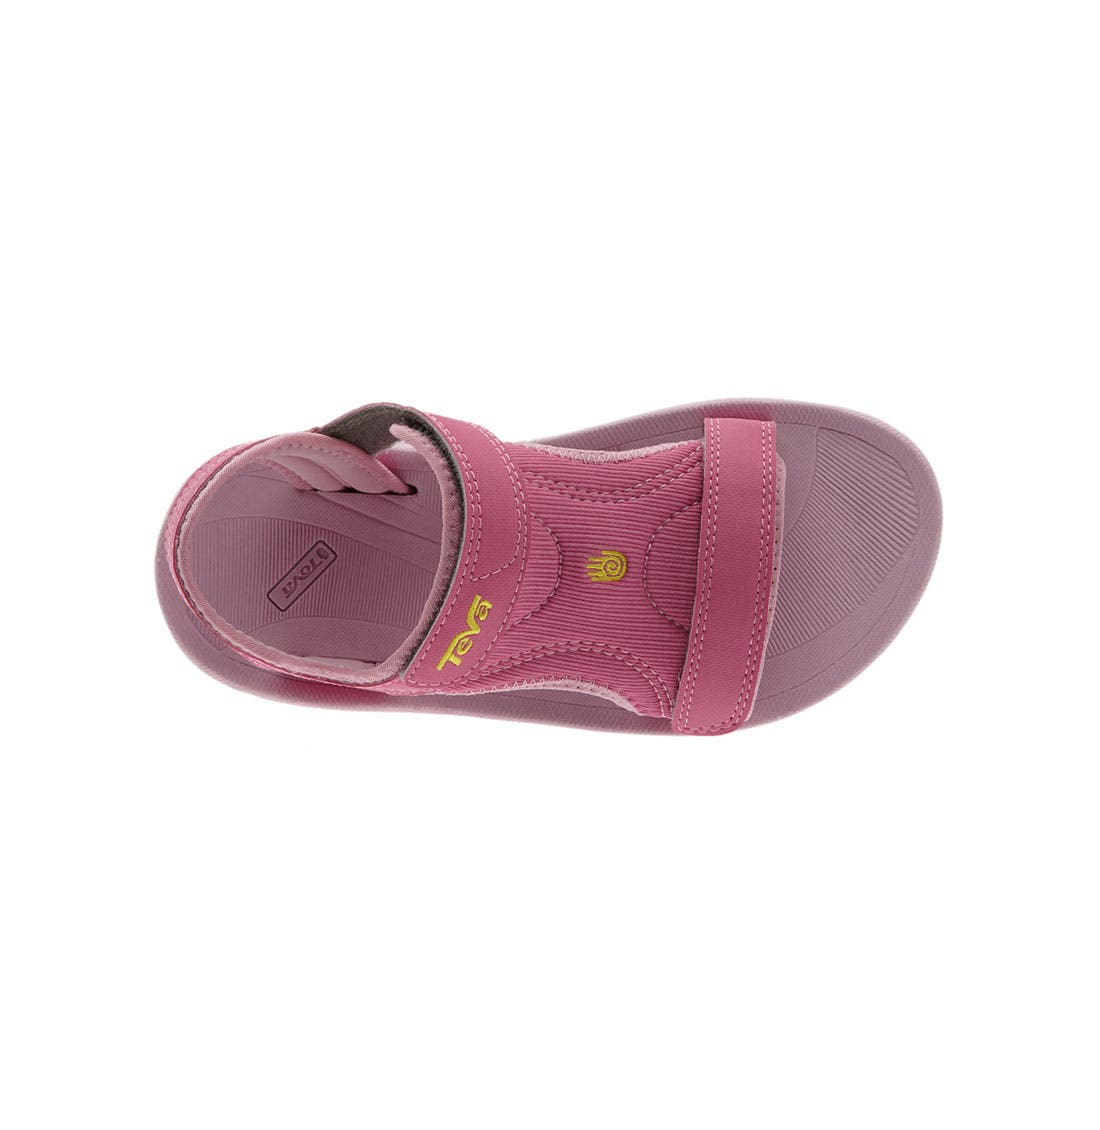 Alternate Image 3  - Teva 'Psyclone' Water Sandal (Toddler, Little Kid & Big Kid)